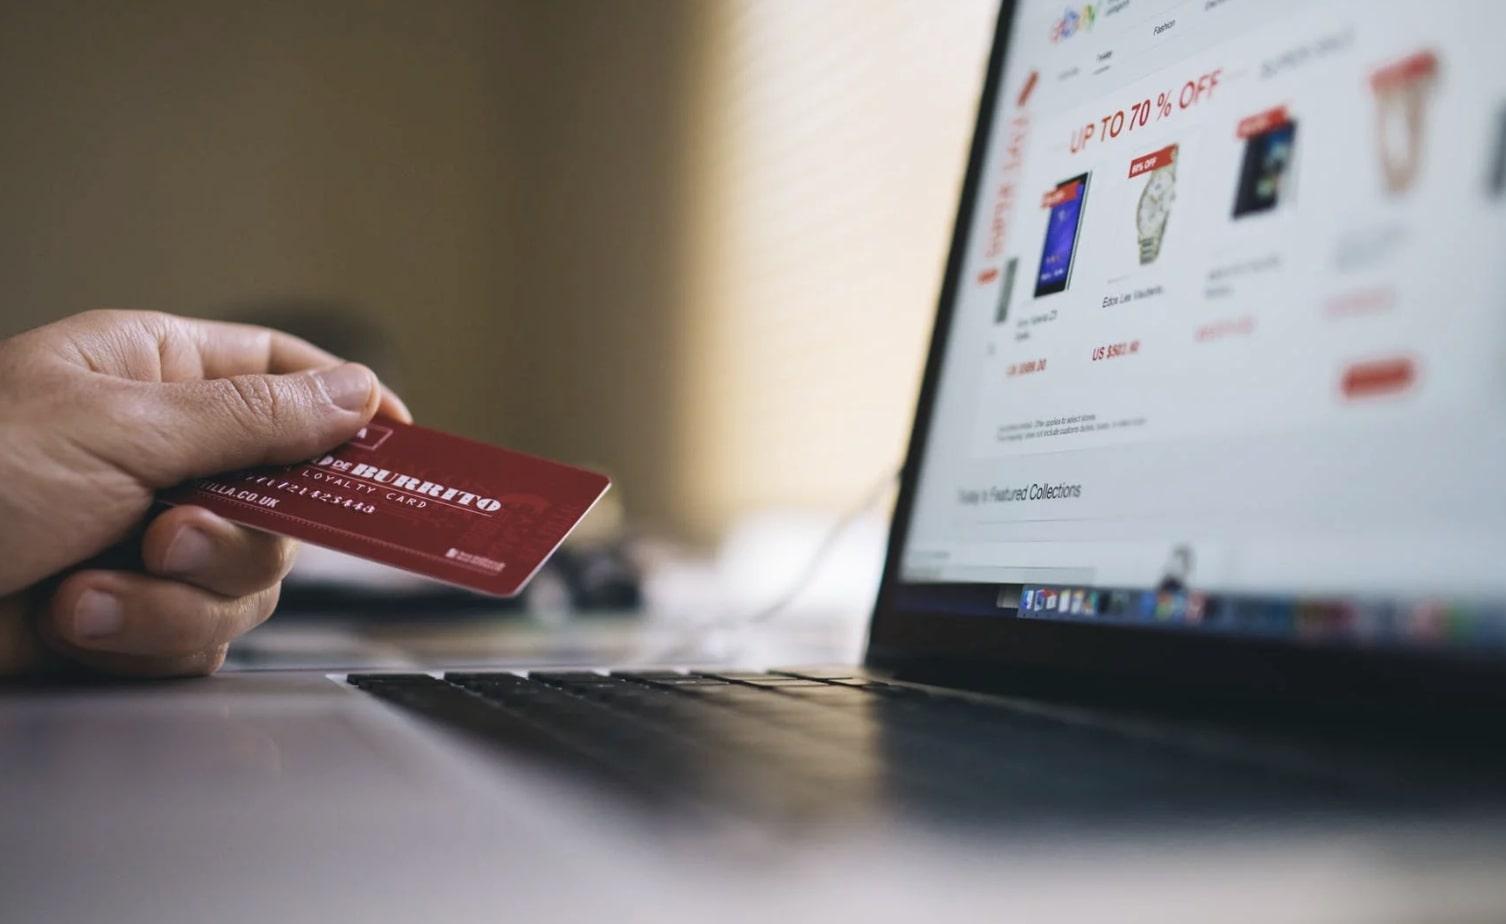 Webar in retail online